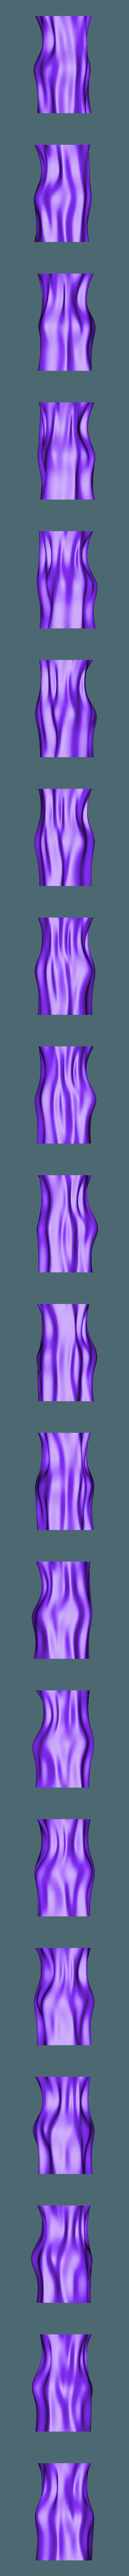 irregular pot.stl Download free STL file irregular thing (pot) • 3D print object, punkain86